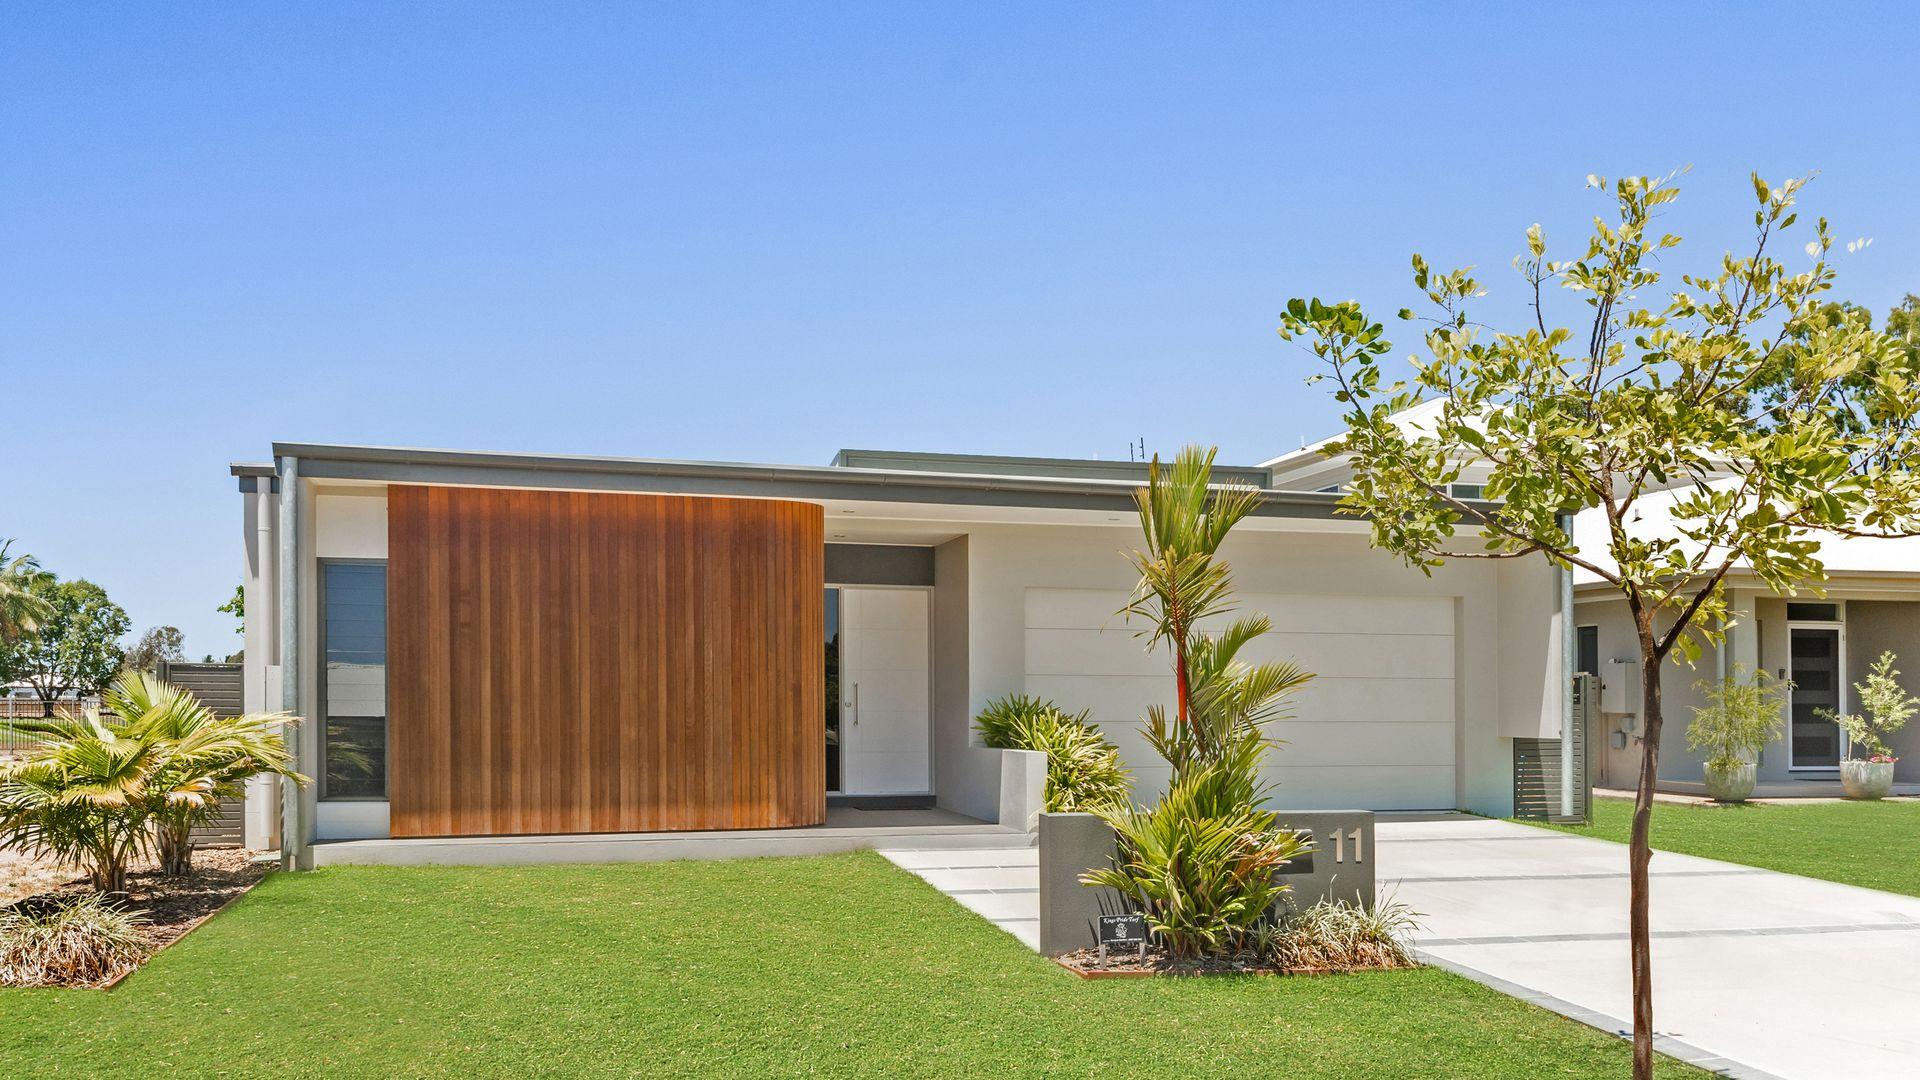 11 Ambrose Lane, Rosslea QLD 4812, Image 11